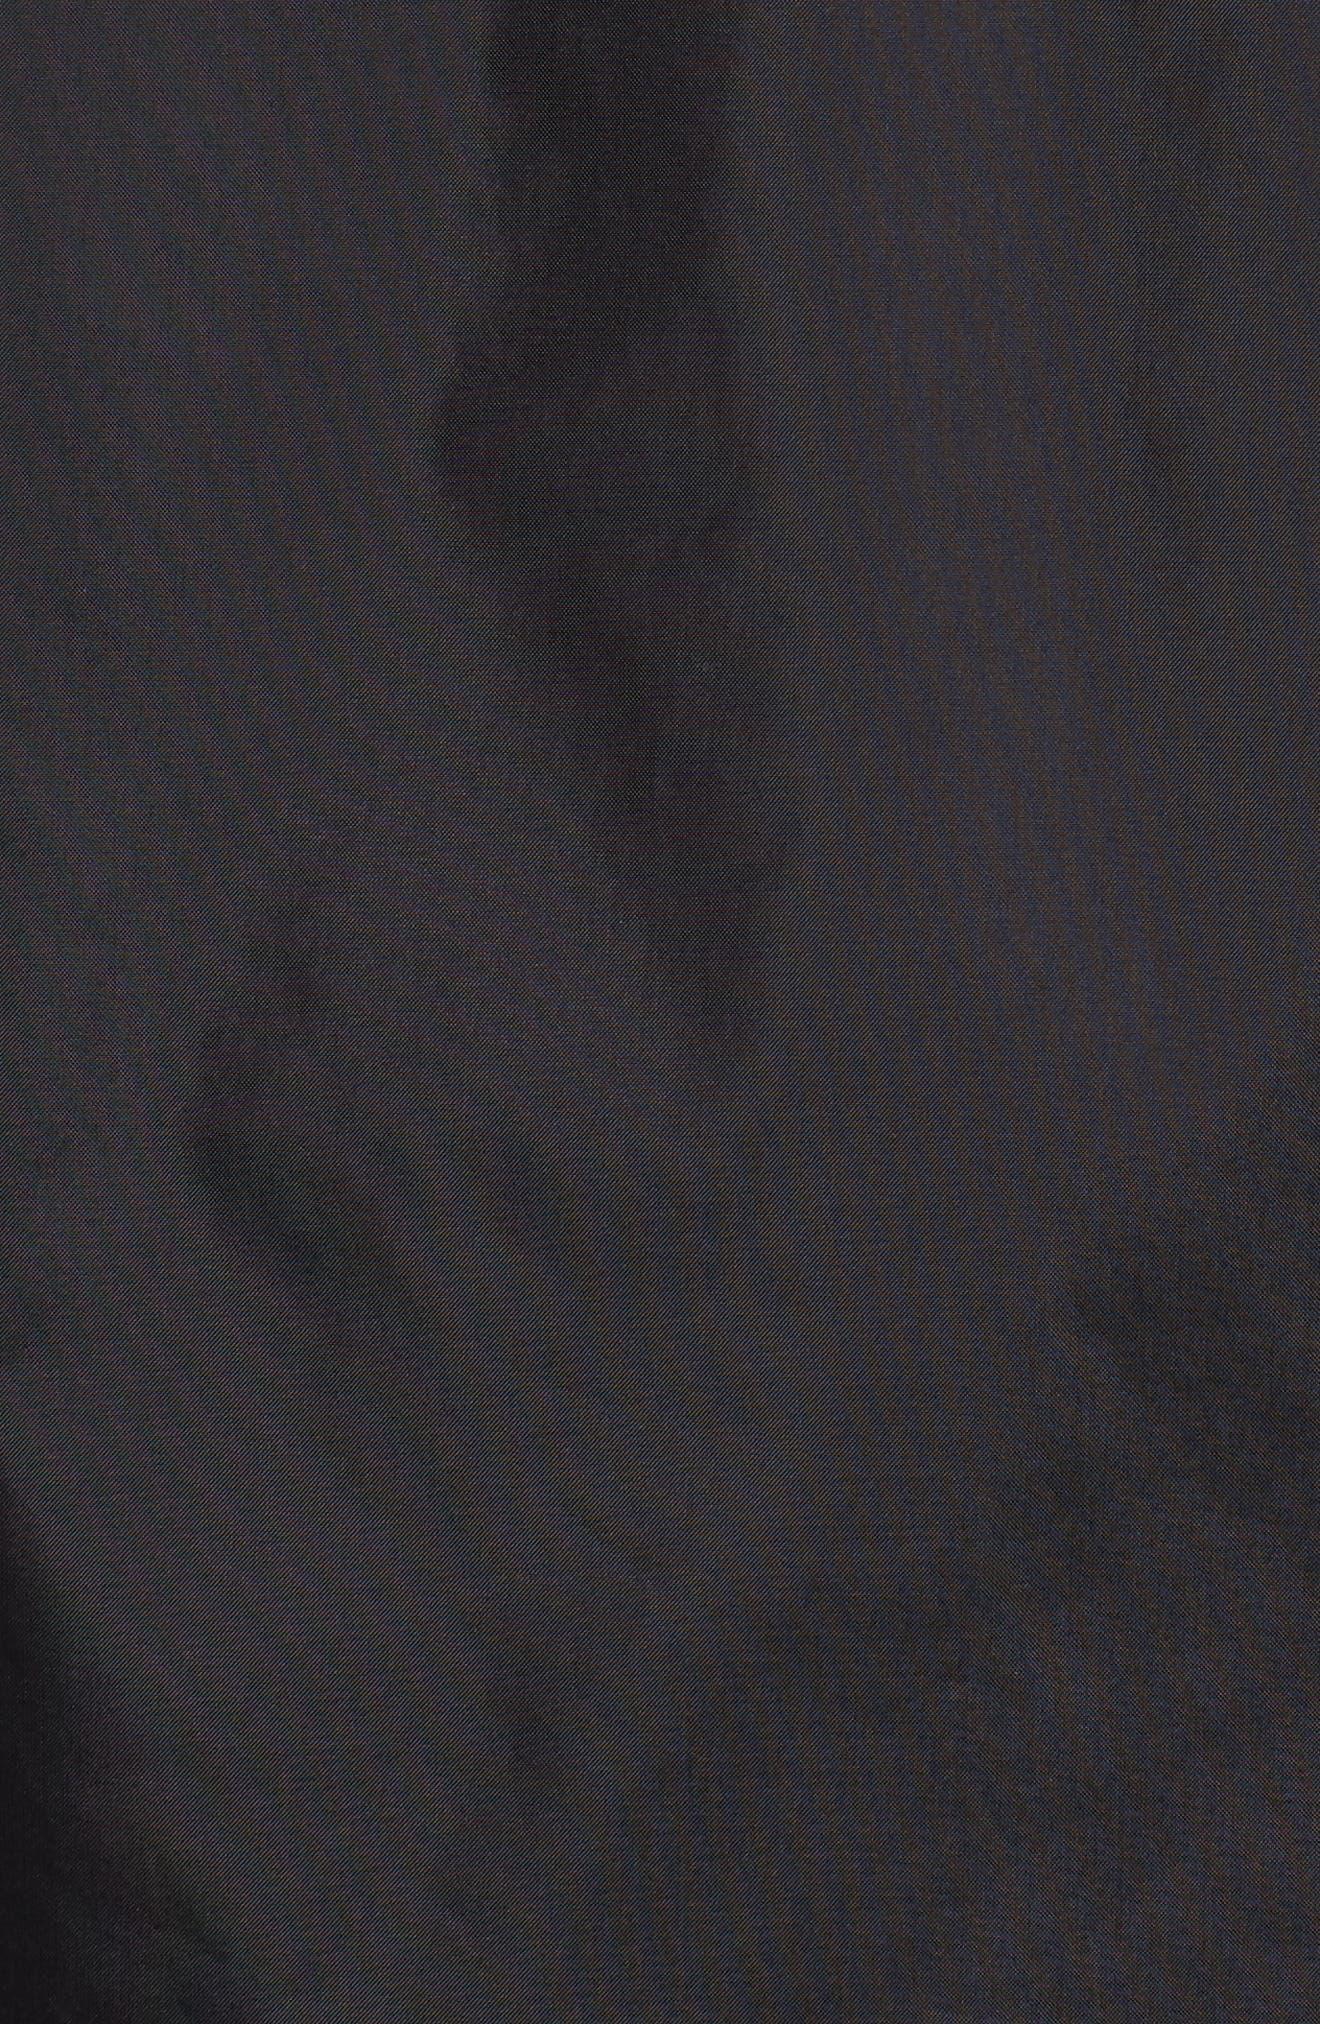 Washburne Anorak,                             Alternate thumbnail 5, color,                             Black